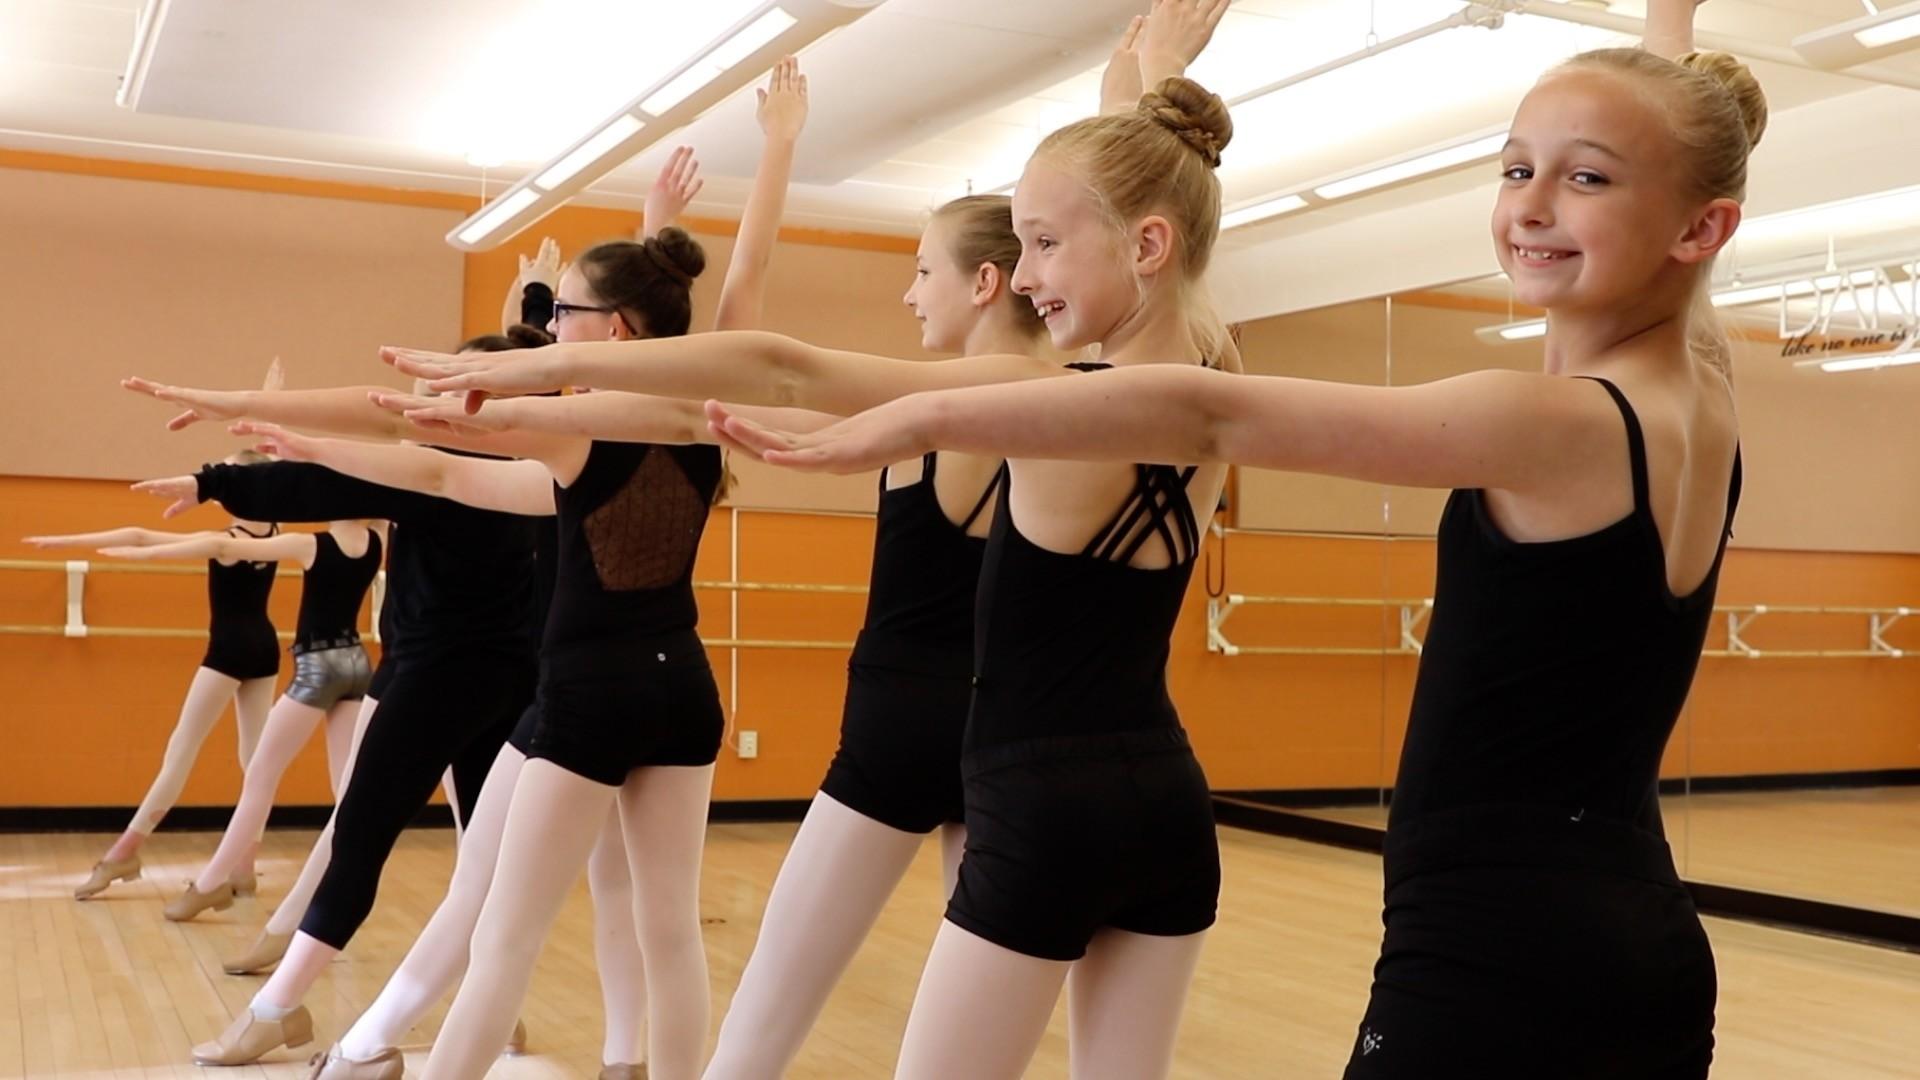 Dance class in studio